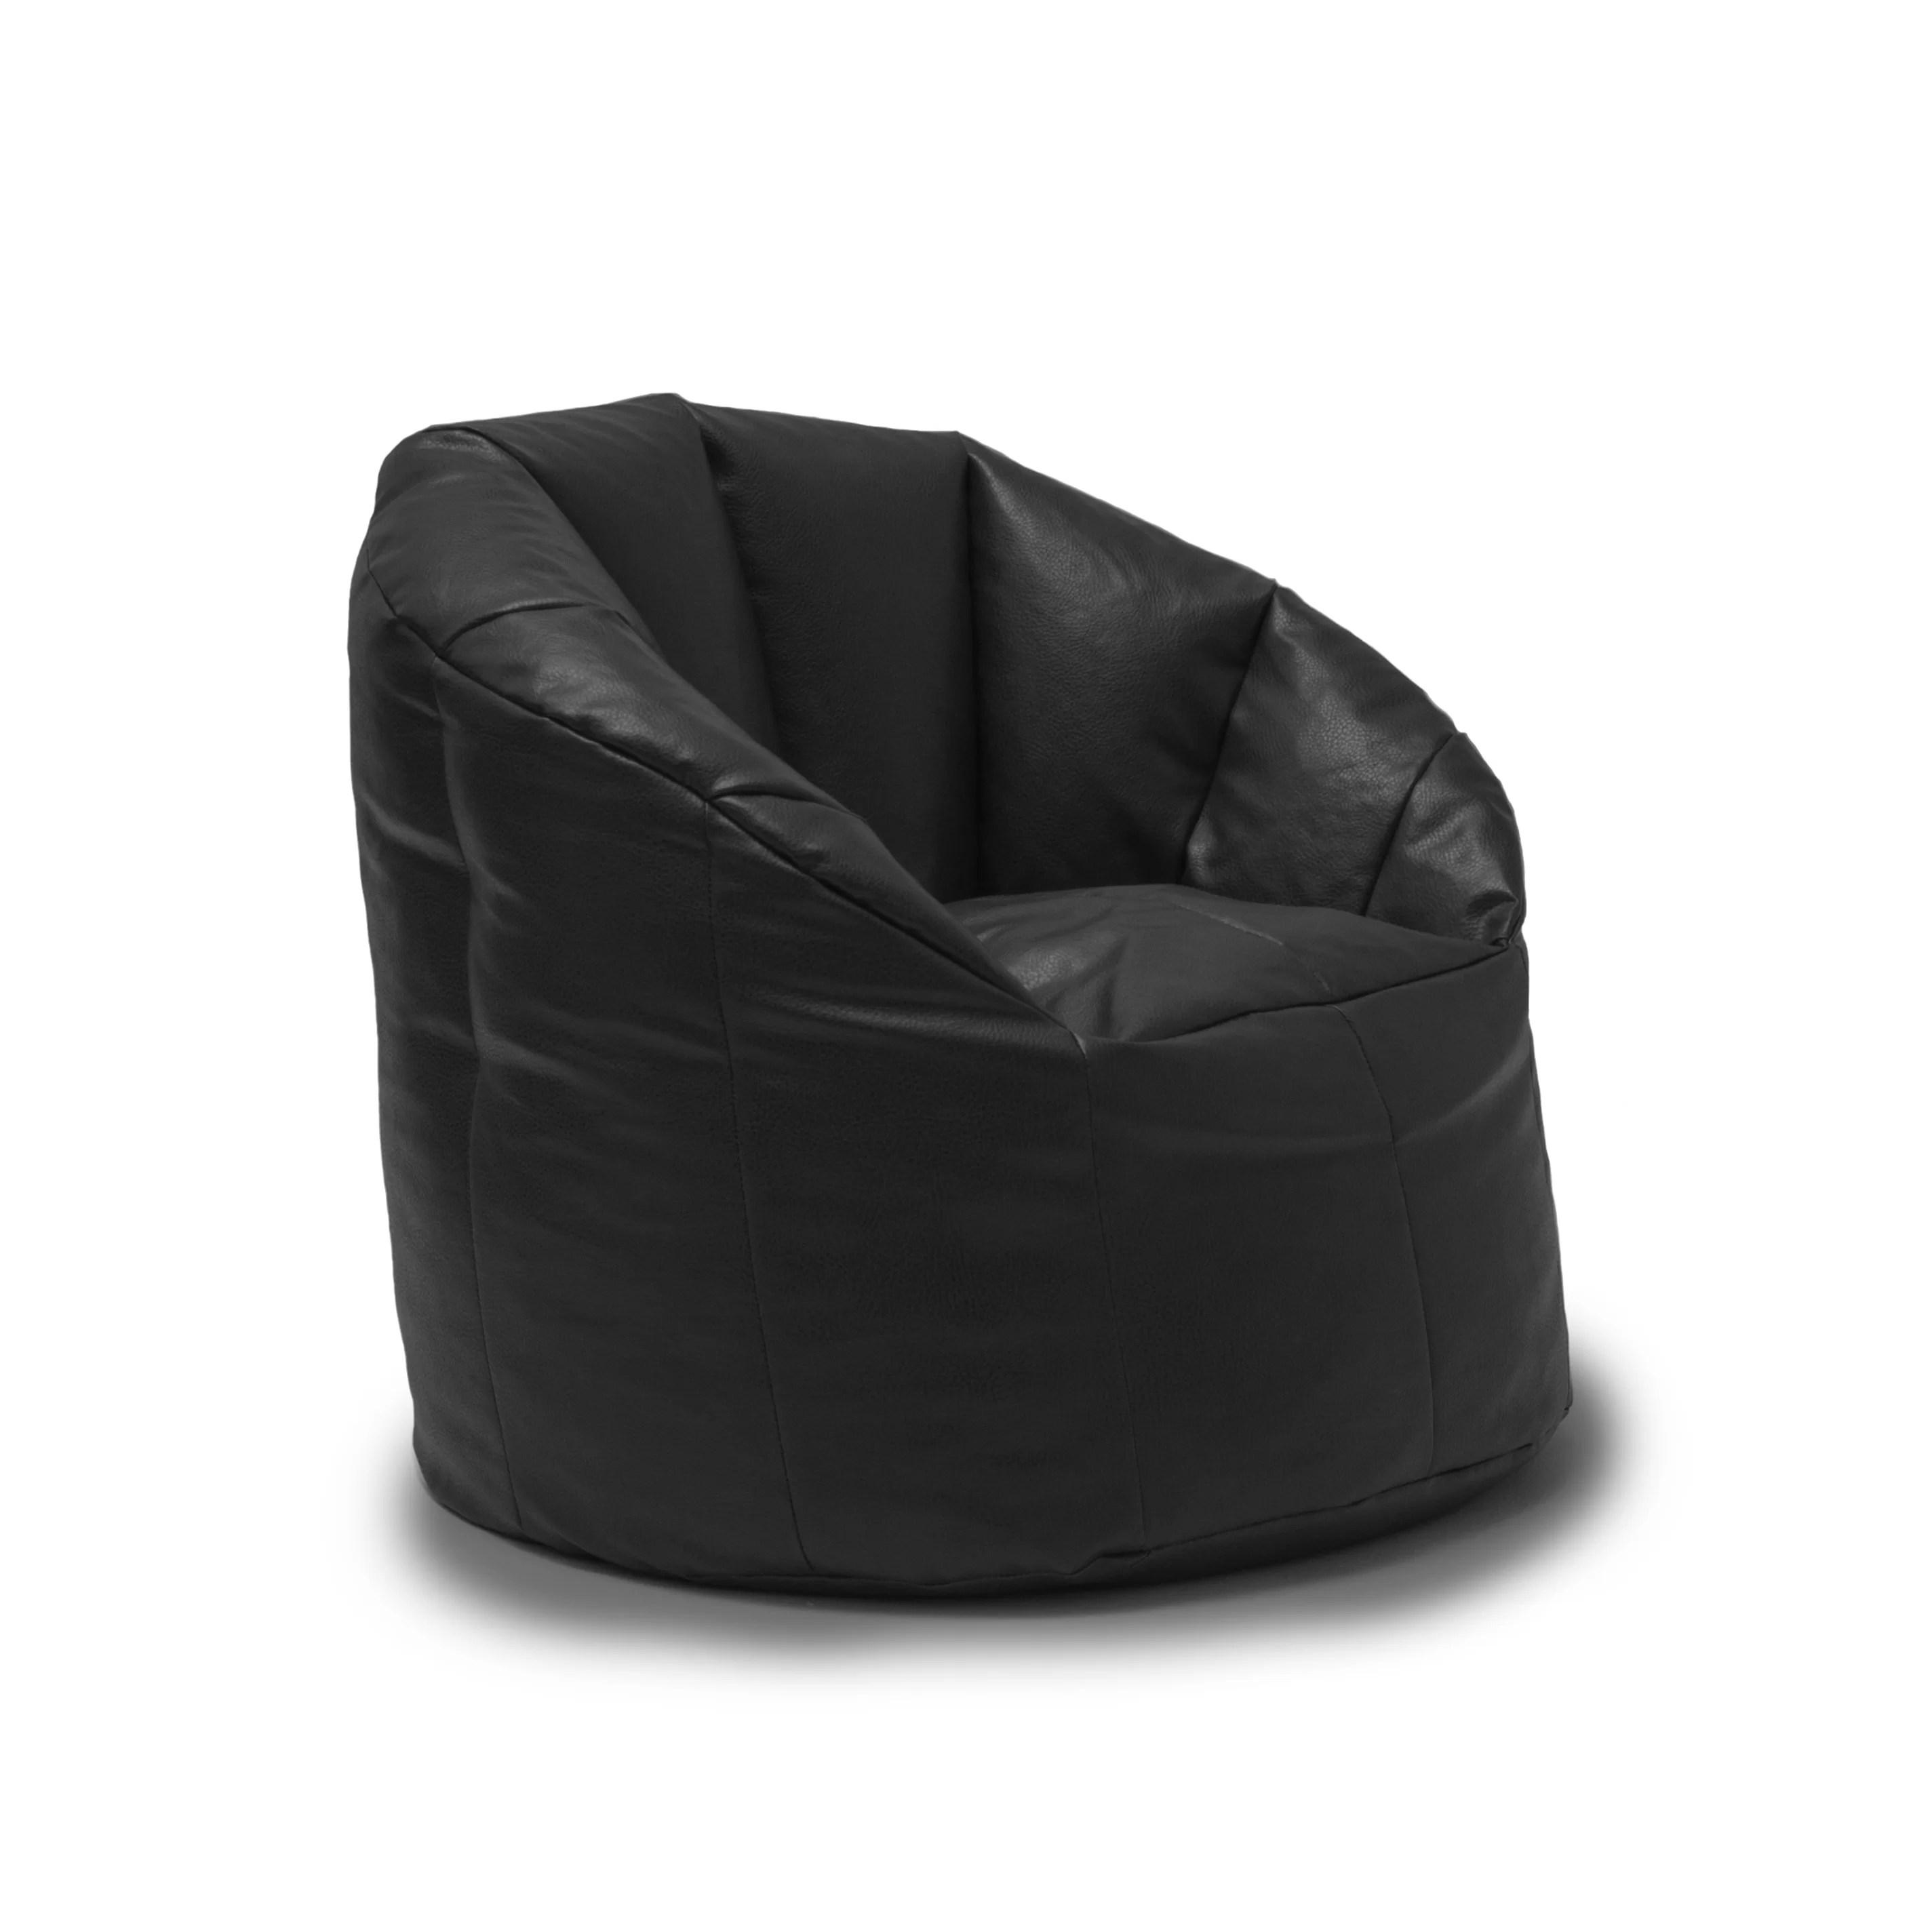 big joe lounge chair cover rental lansing mi comfort research milano bean bag lounger and reviews